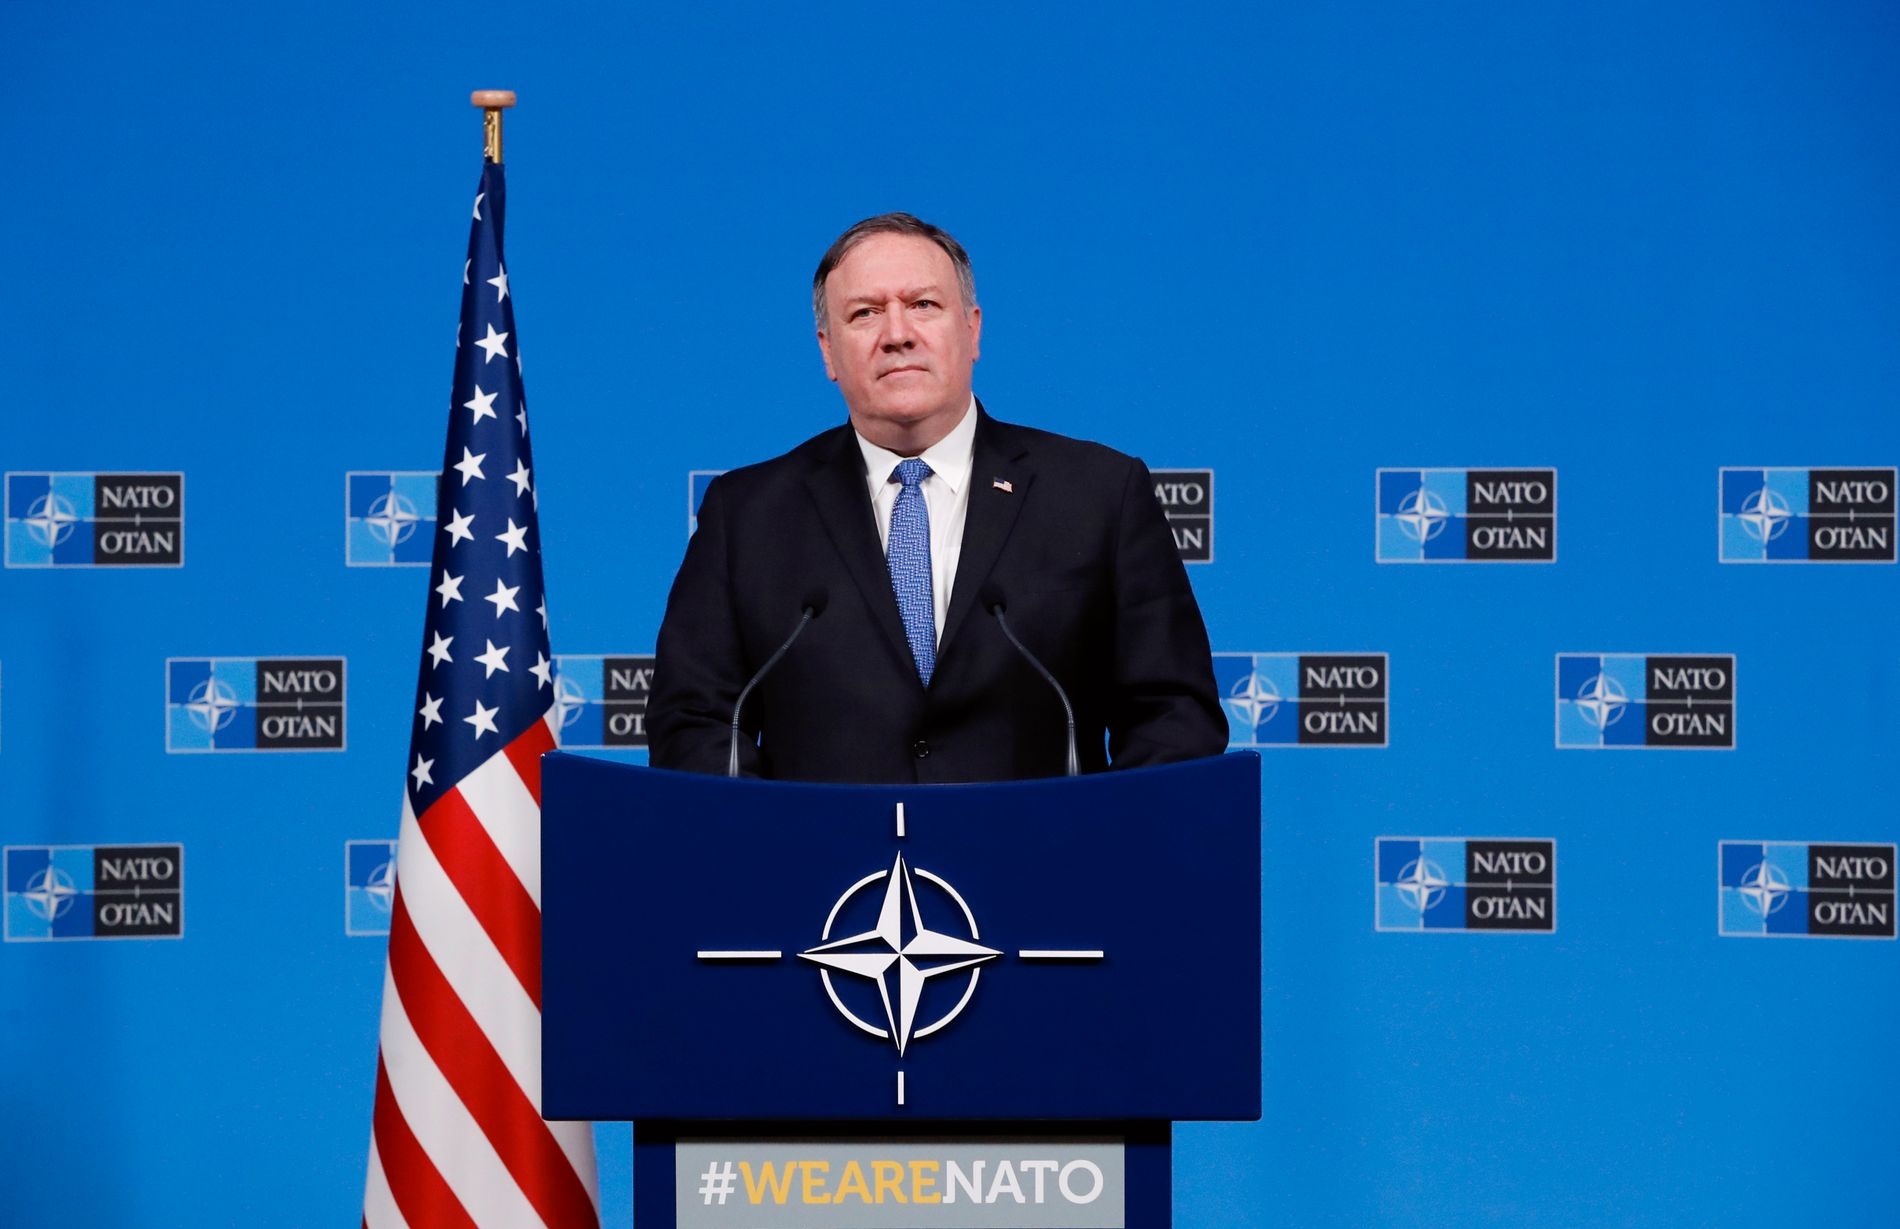 REAGERER: Den amerikanske utenriksministeren Mike Pompeo under en pressekonferanse i Brussel tirsdag.